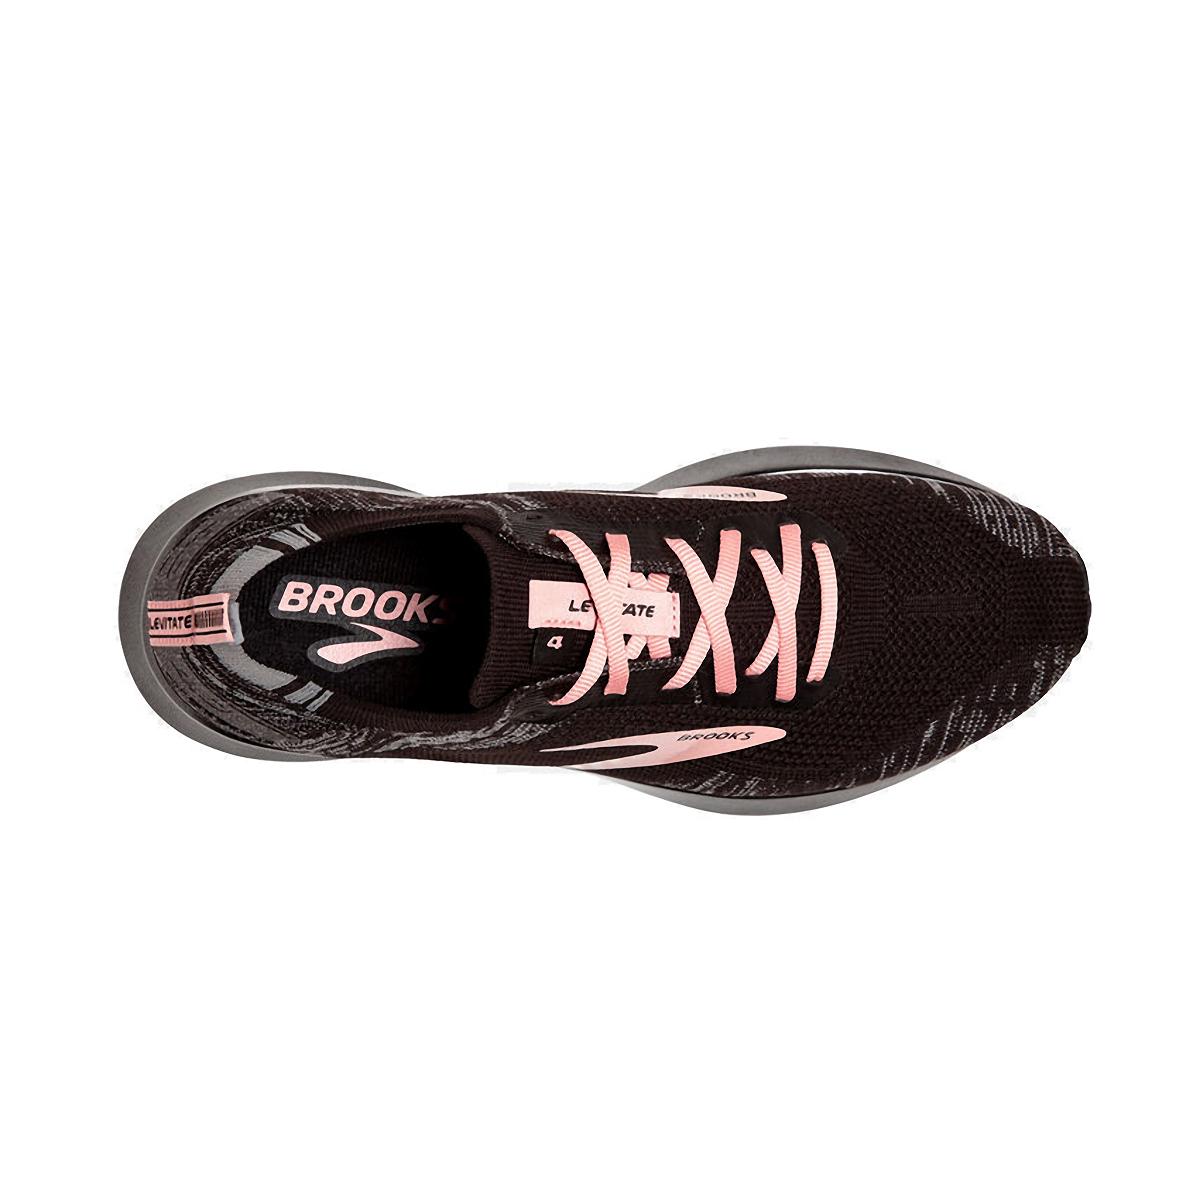 Women's Brooks Levitate 4 Running Shoe - Color: Black/Grey/Coral - Size: 5 - Width: Regular, Black/Grey/Coral, large, image 5